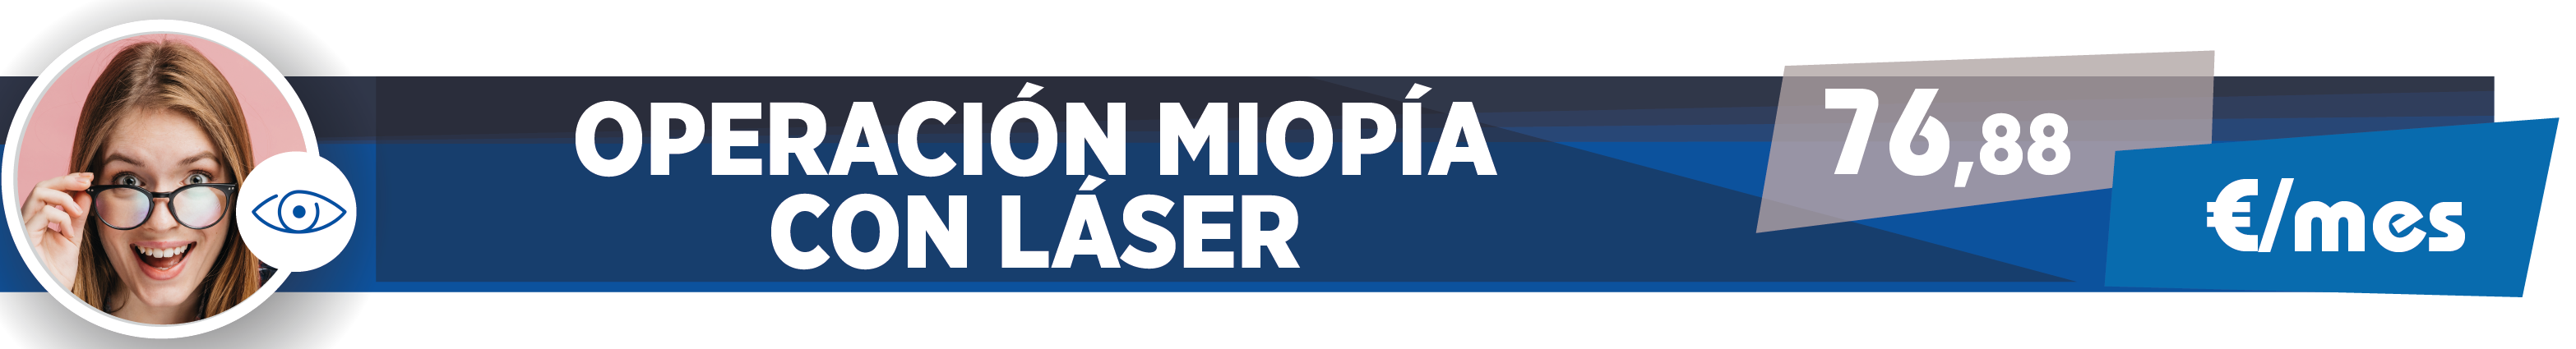 Tratamiento Miopía Láser Tenerife